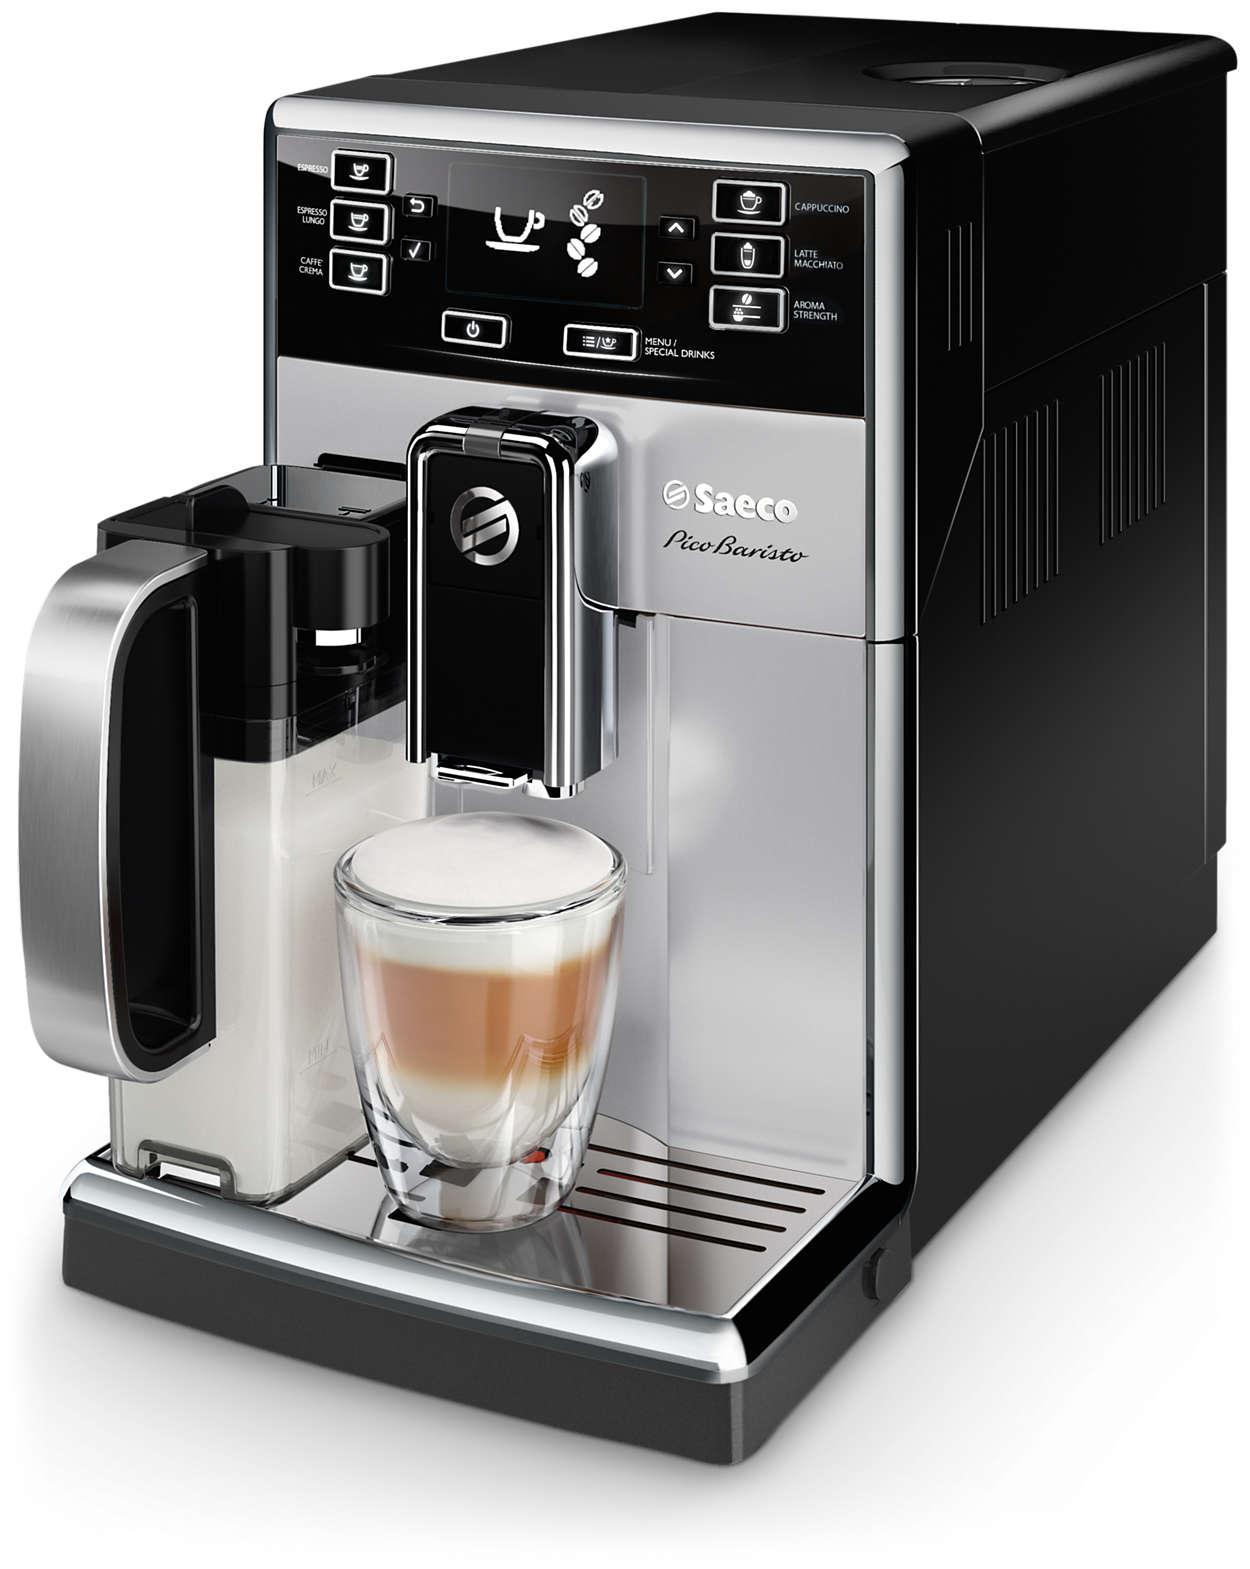 picobaristo kaffeevollautomat sm3061 10 saeco. Black Bedroom Furniture Sets. Home Design Ideas